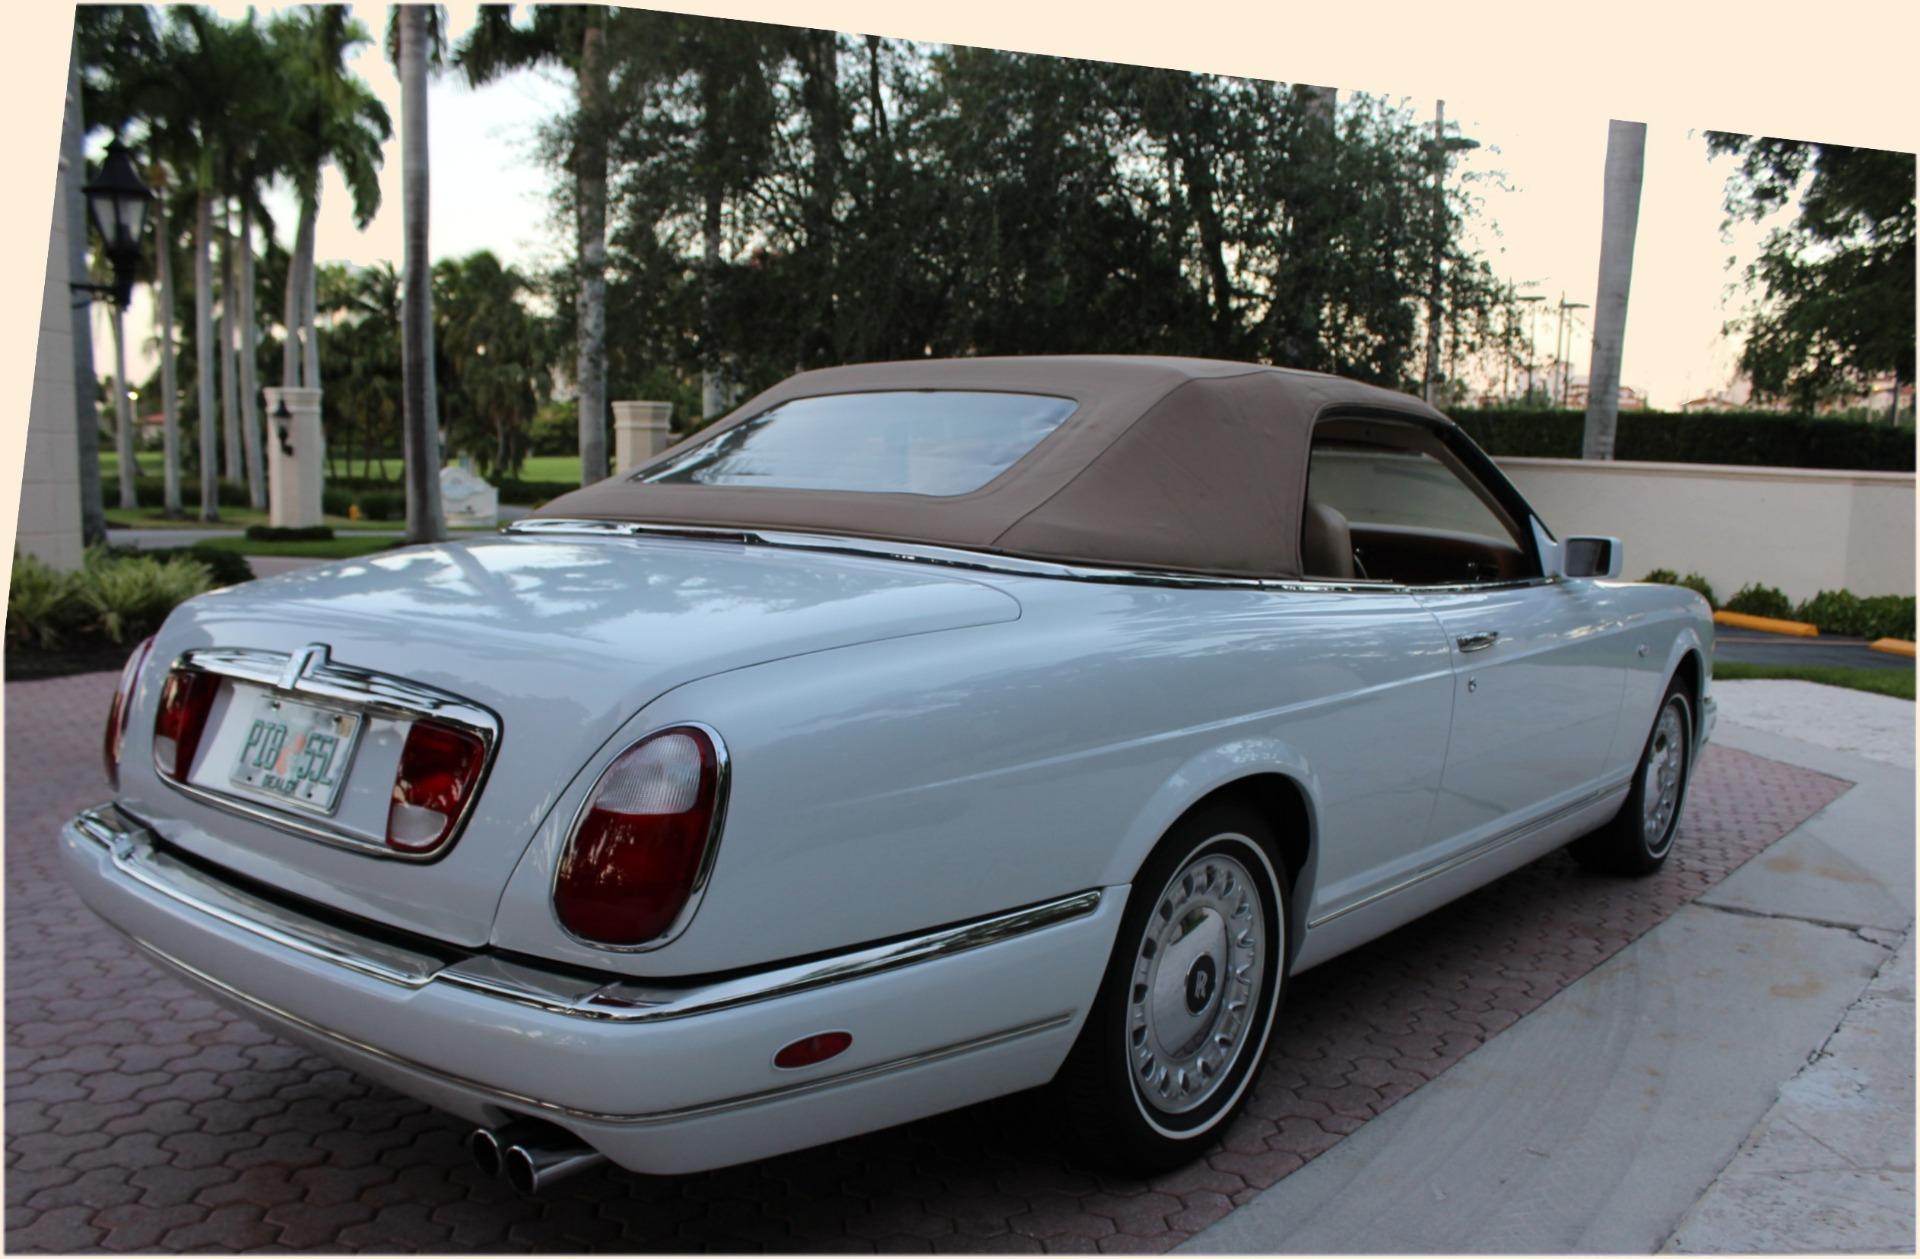 Used-2001-Rolls-Royce-Corniche-335-Hp-Turbo